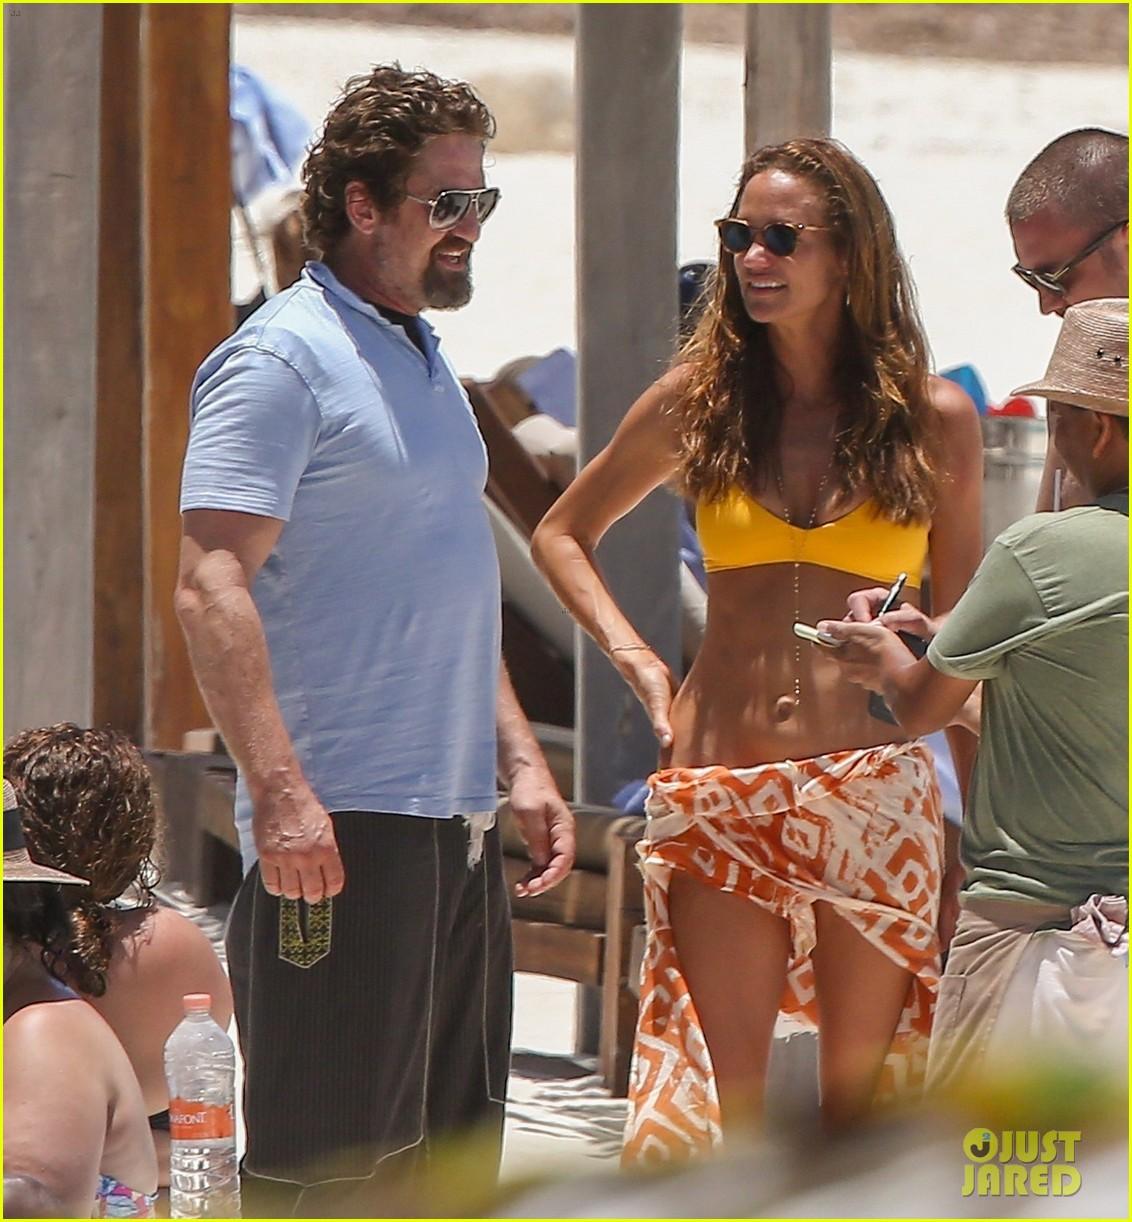 gerard butler on again gf hit the beach in mexico013922437